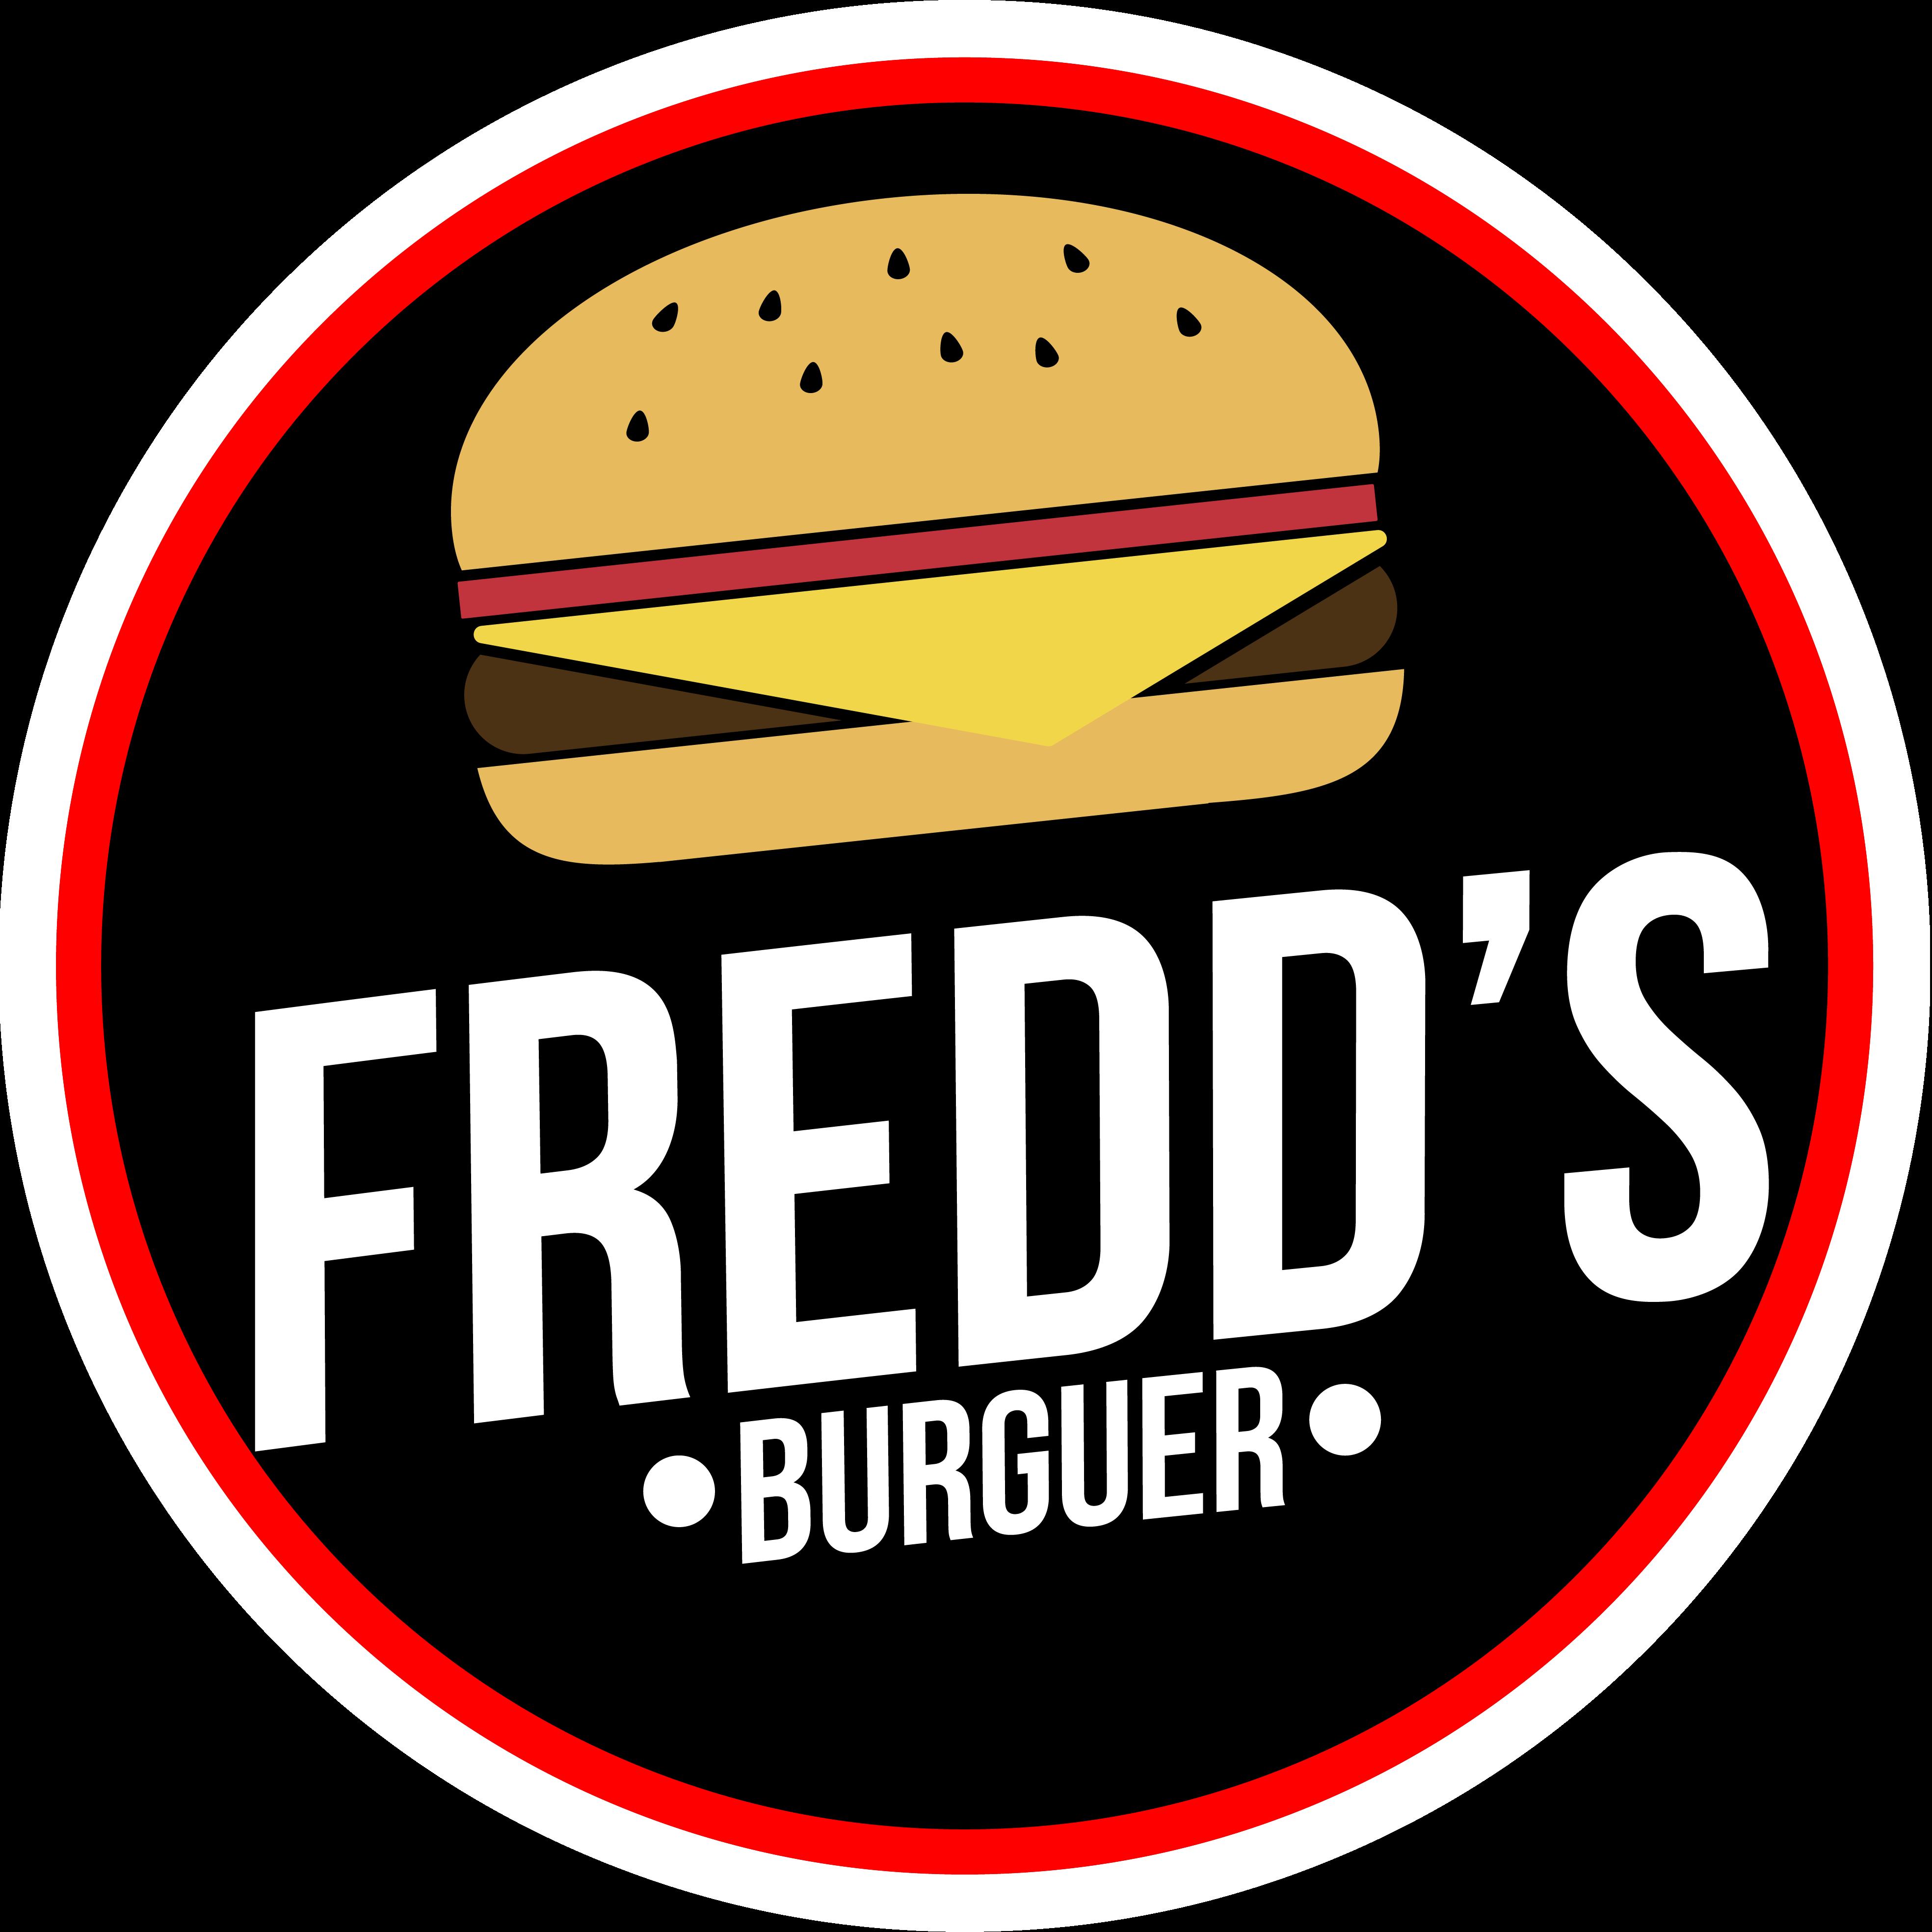 FREDD'S BURGUER